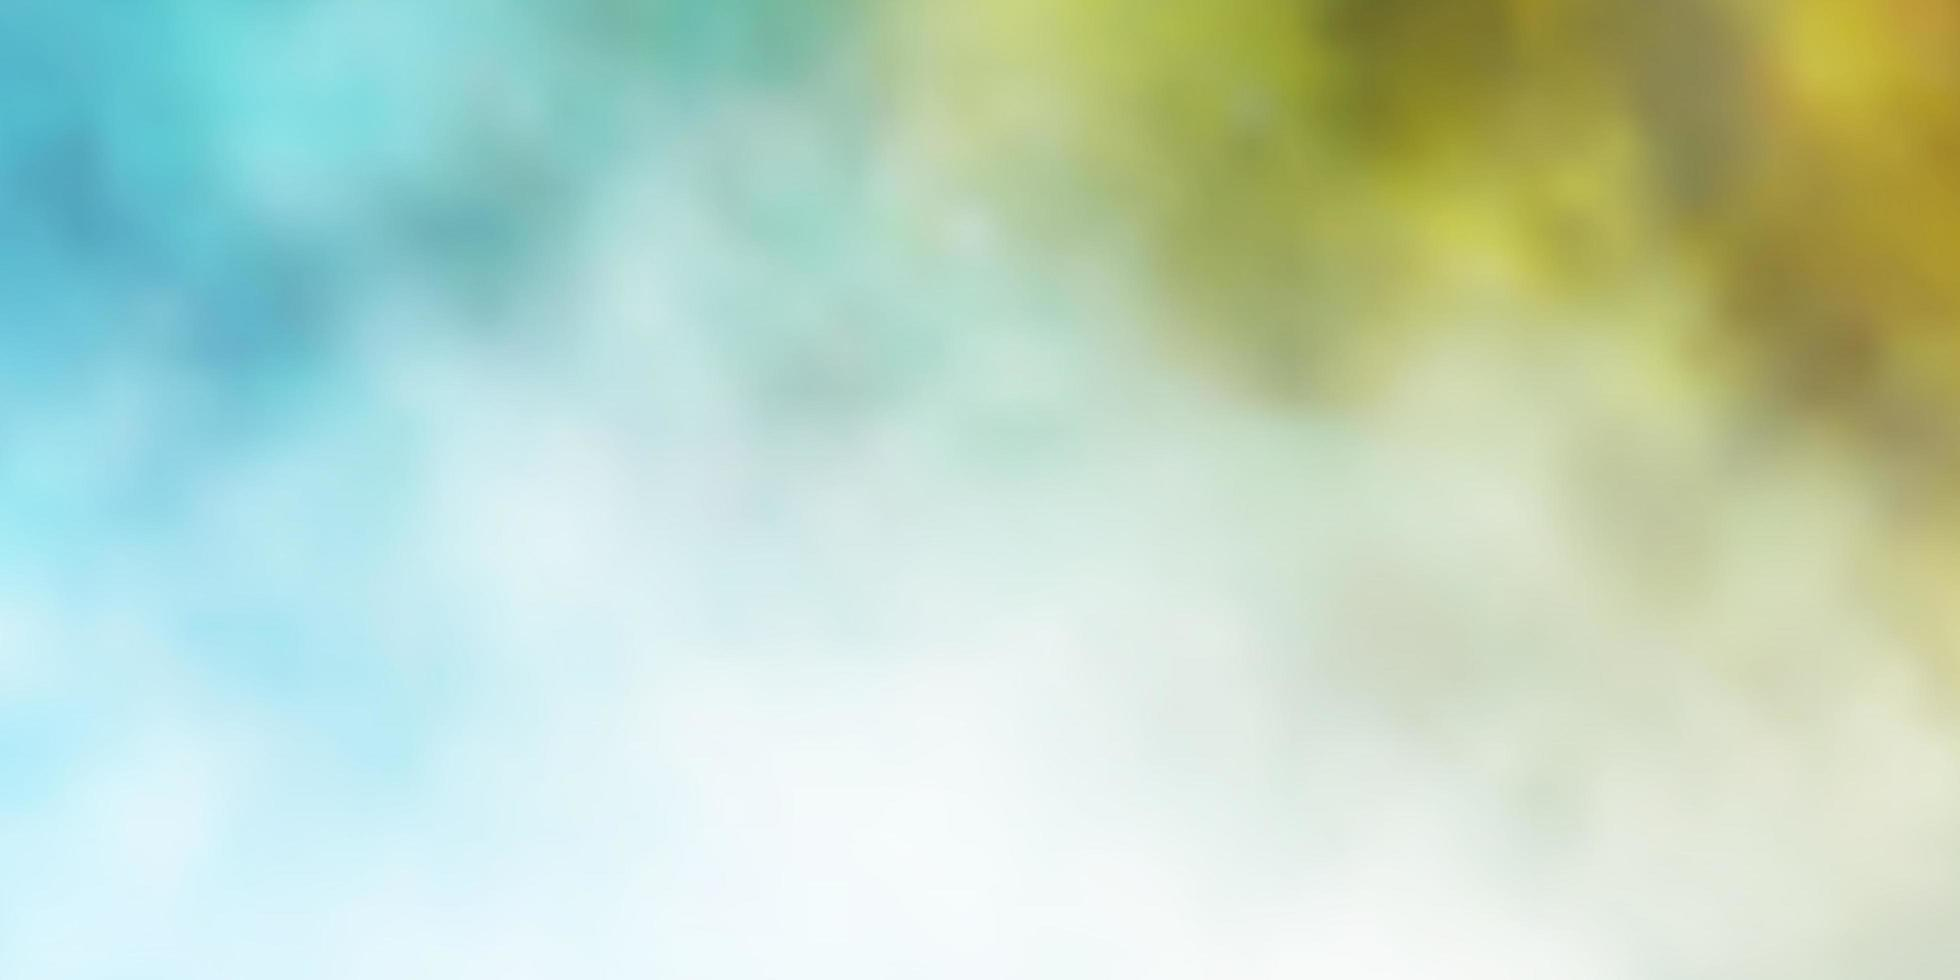 lichtblauwe, gele vectorachtergrond met wolken. vector